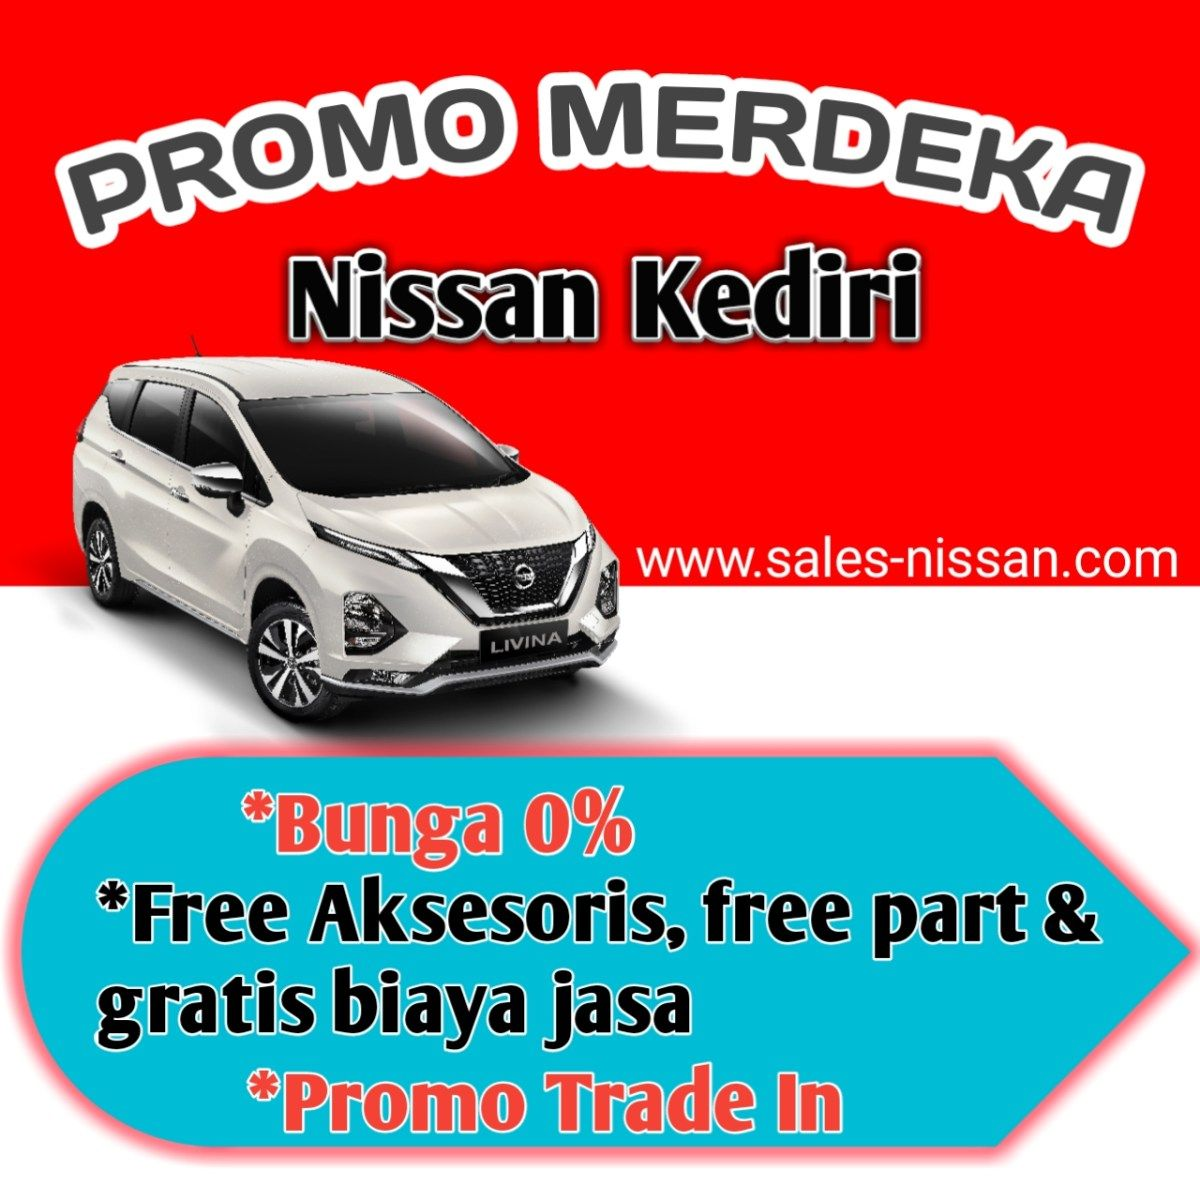 NISSAN KEDIRI PROMO MERDEKA AGUSTUS 2020 di 2020 Nissan